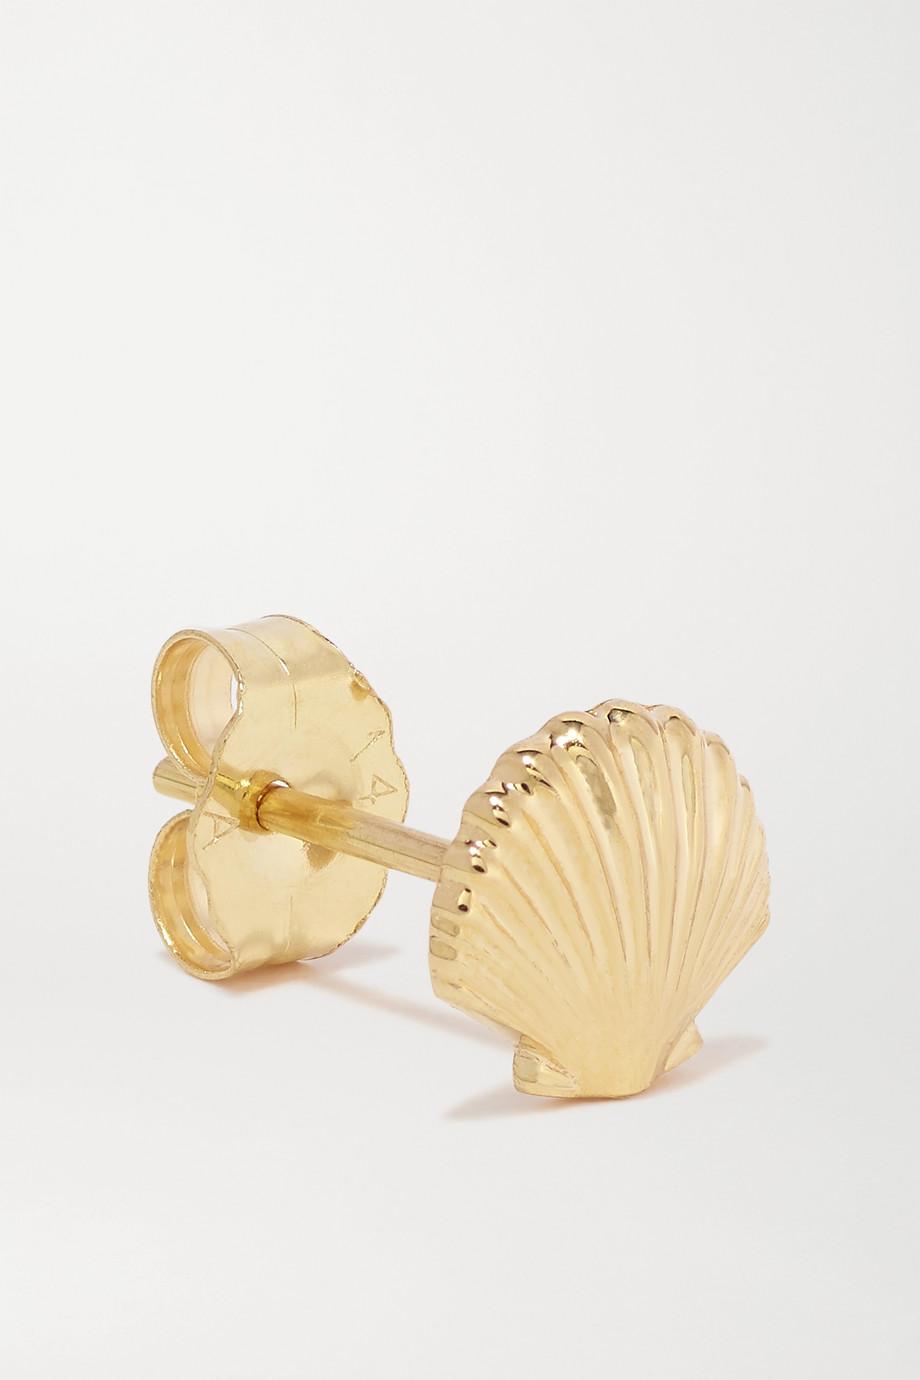 Alison Lou Seashell Ohrring aus 14 Karat Gold